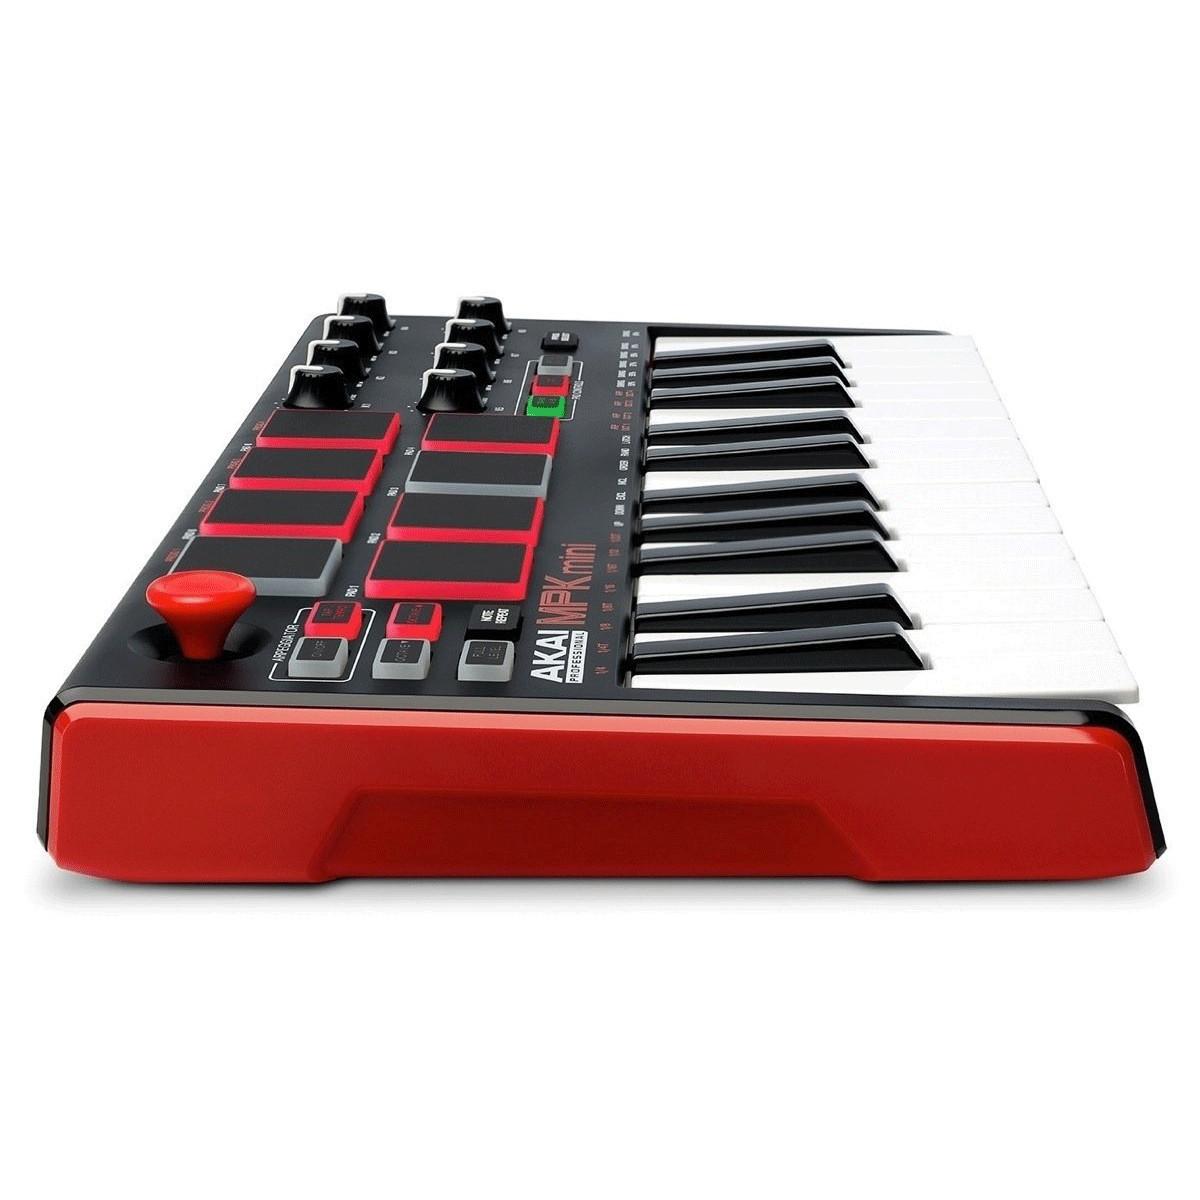 akai mpk mini mk 2 laptop production keyboard b stock at gear4music. Black Bedroom Furniture Sets. Home Design Ideas